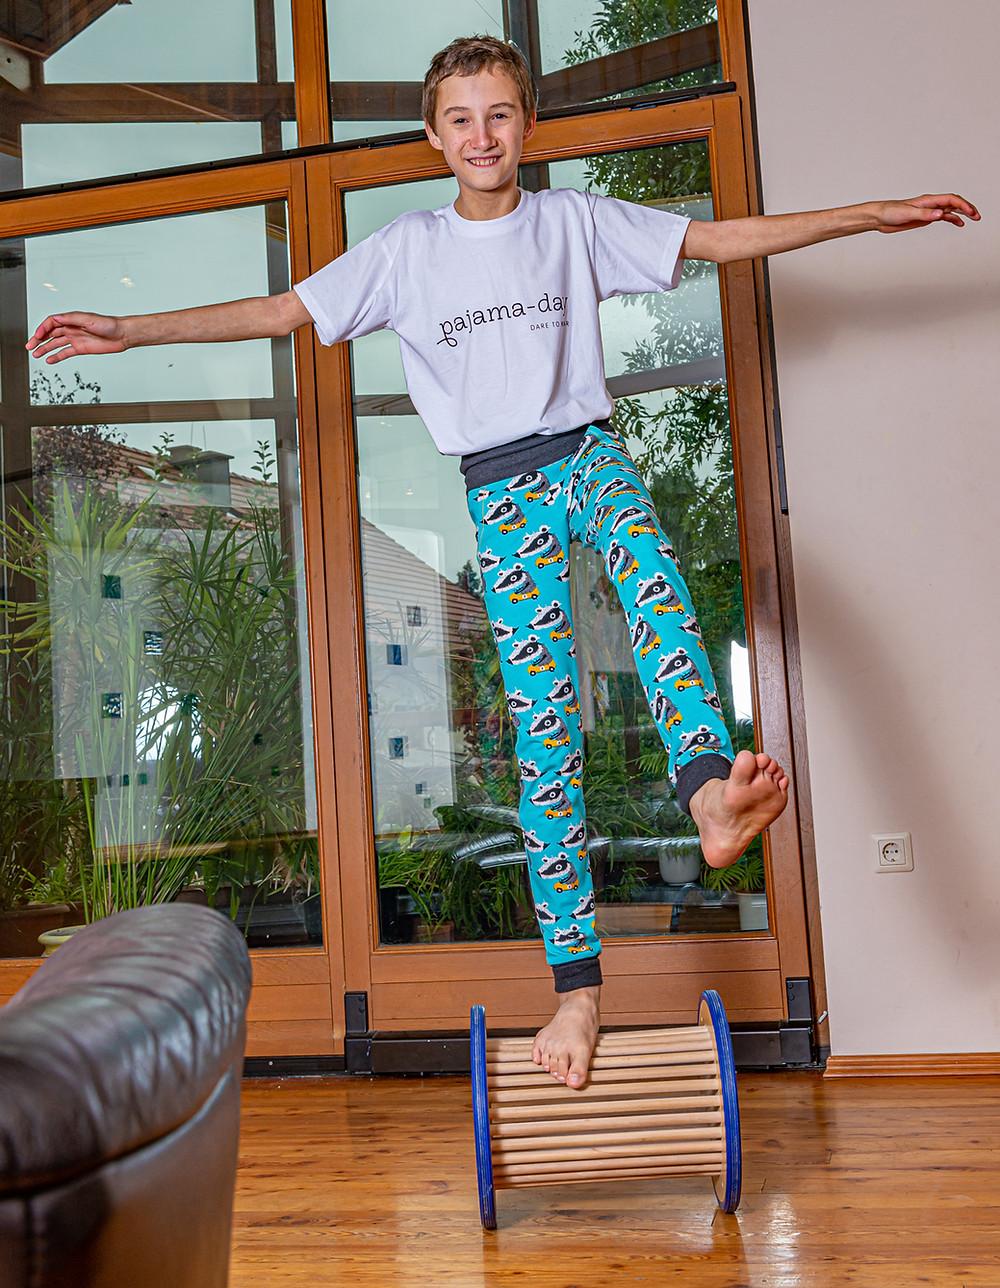 pajama-day Pyjamahose kind Neurodermitis 6 Tipps die helfen